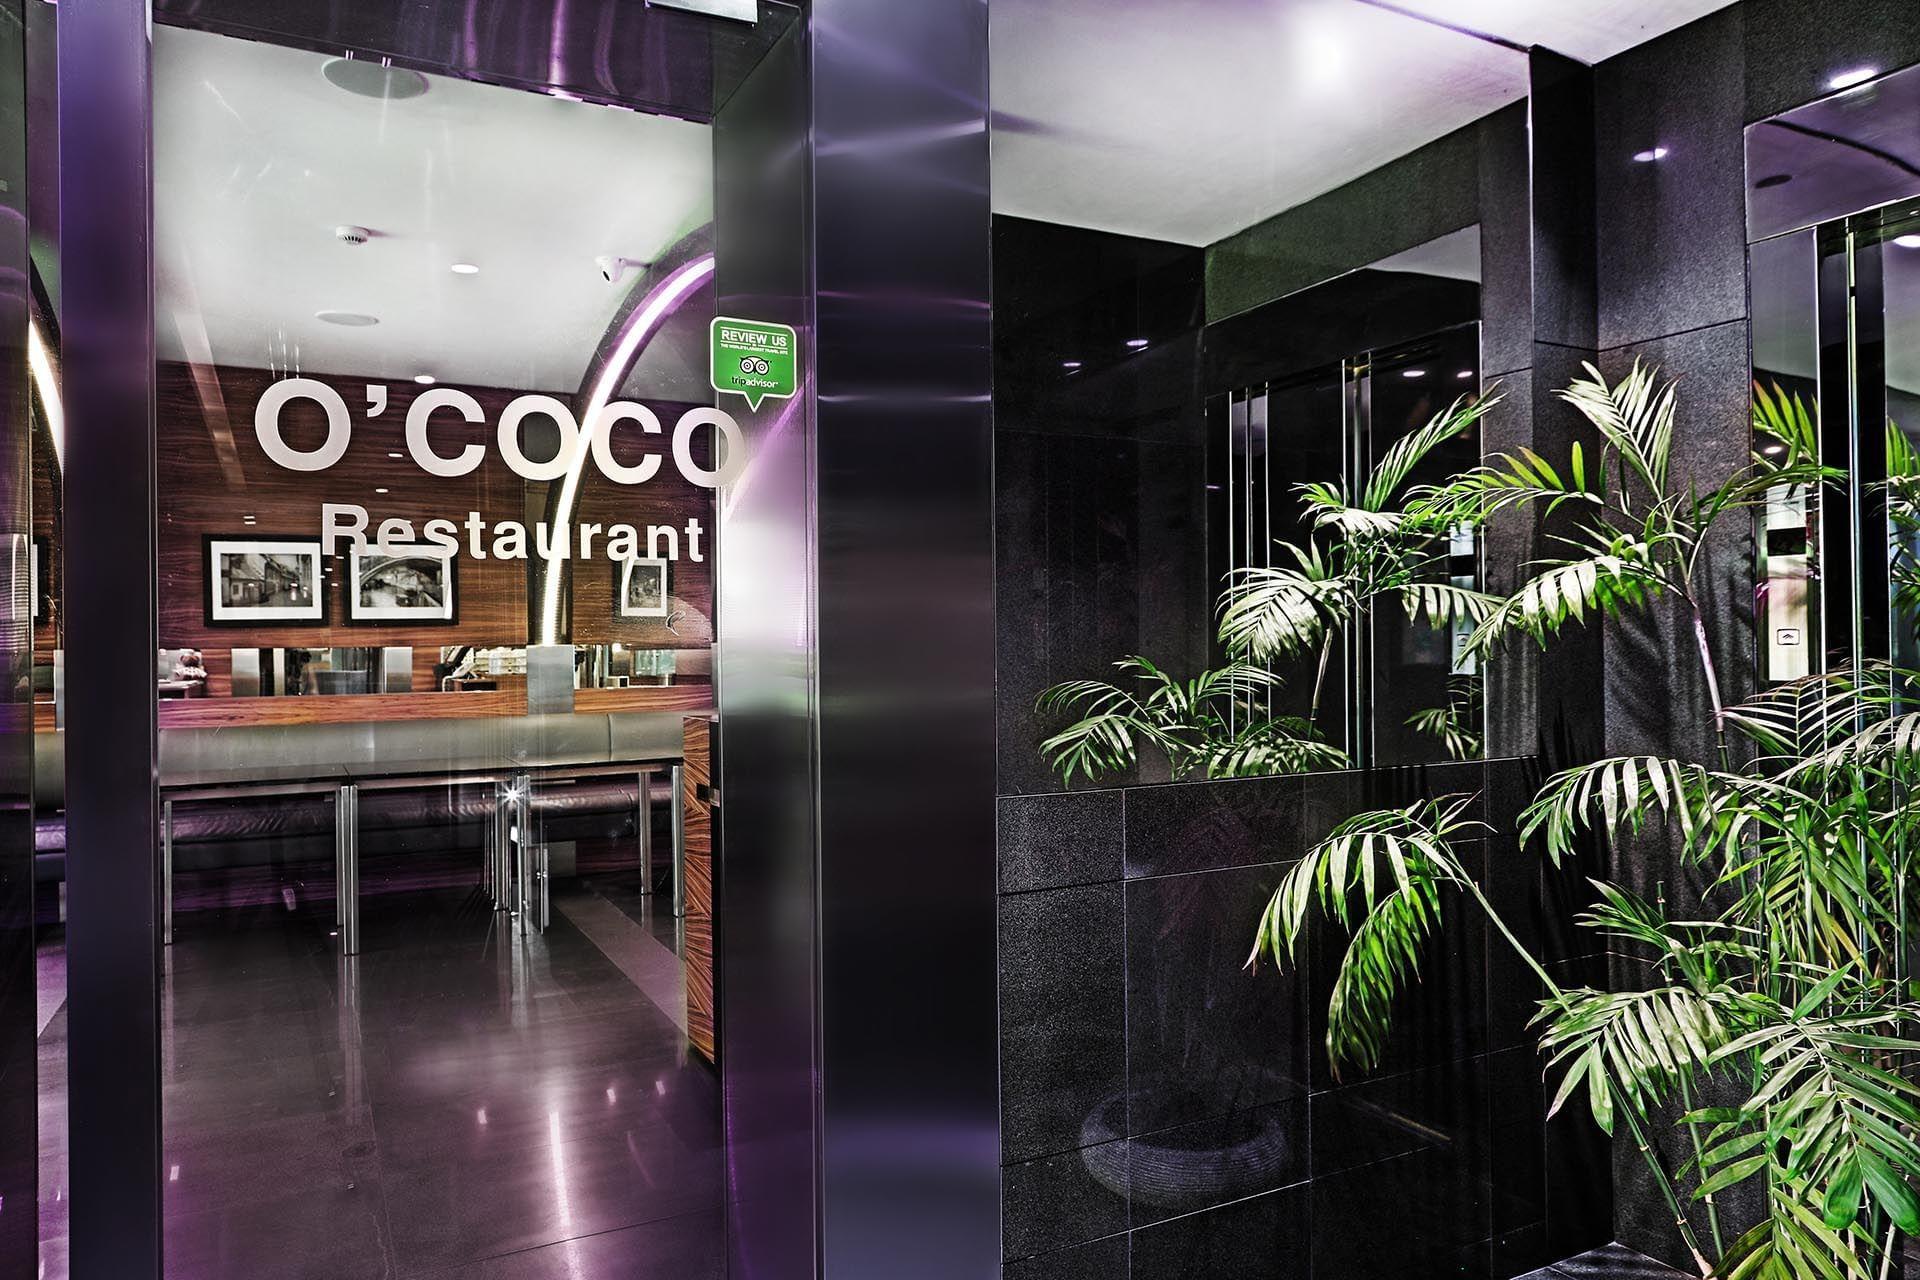 O'cocco Restaurant outside